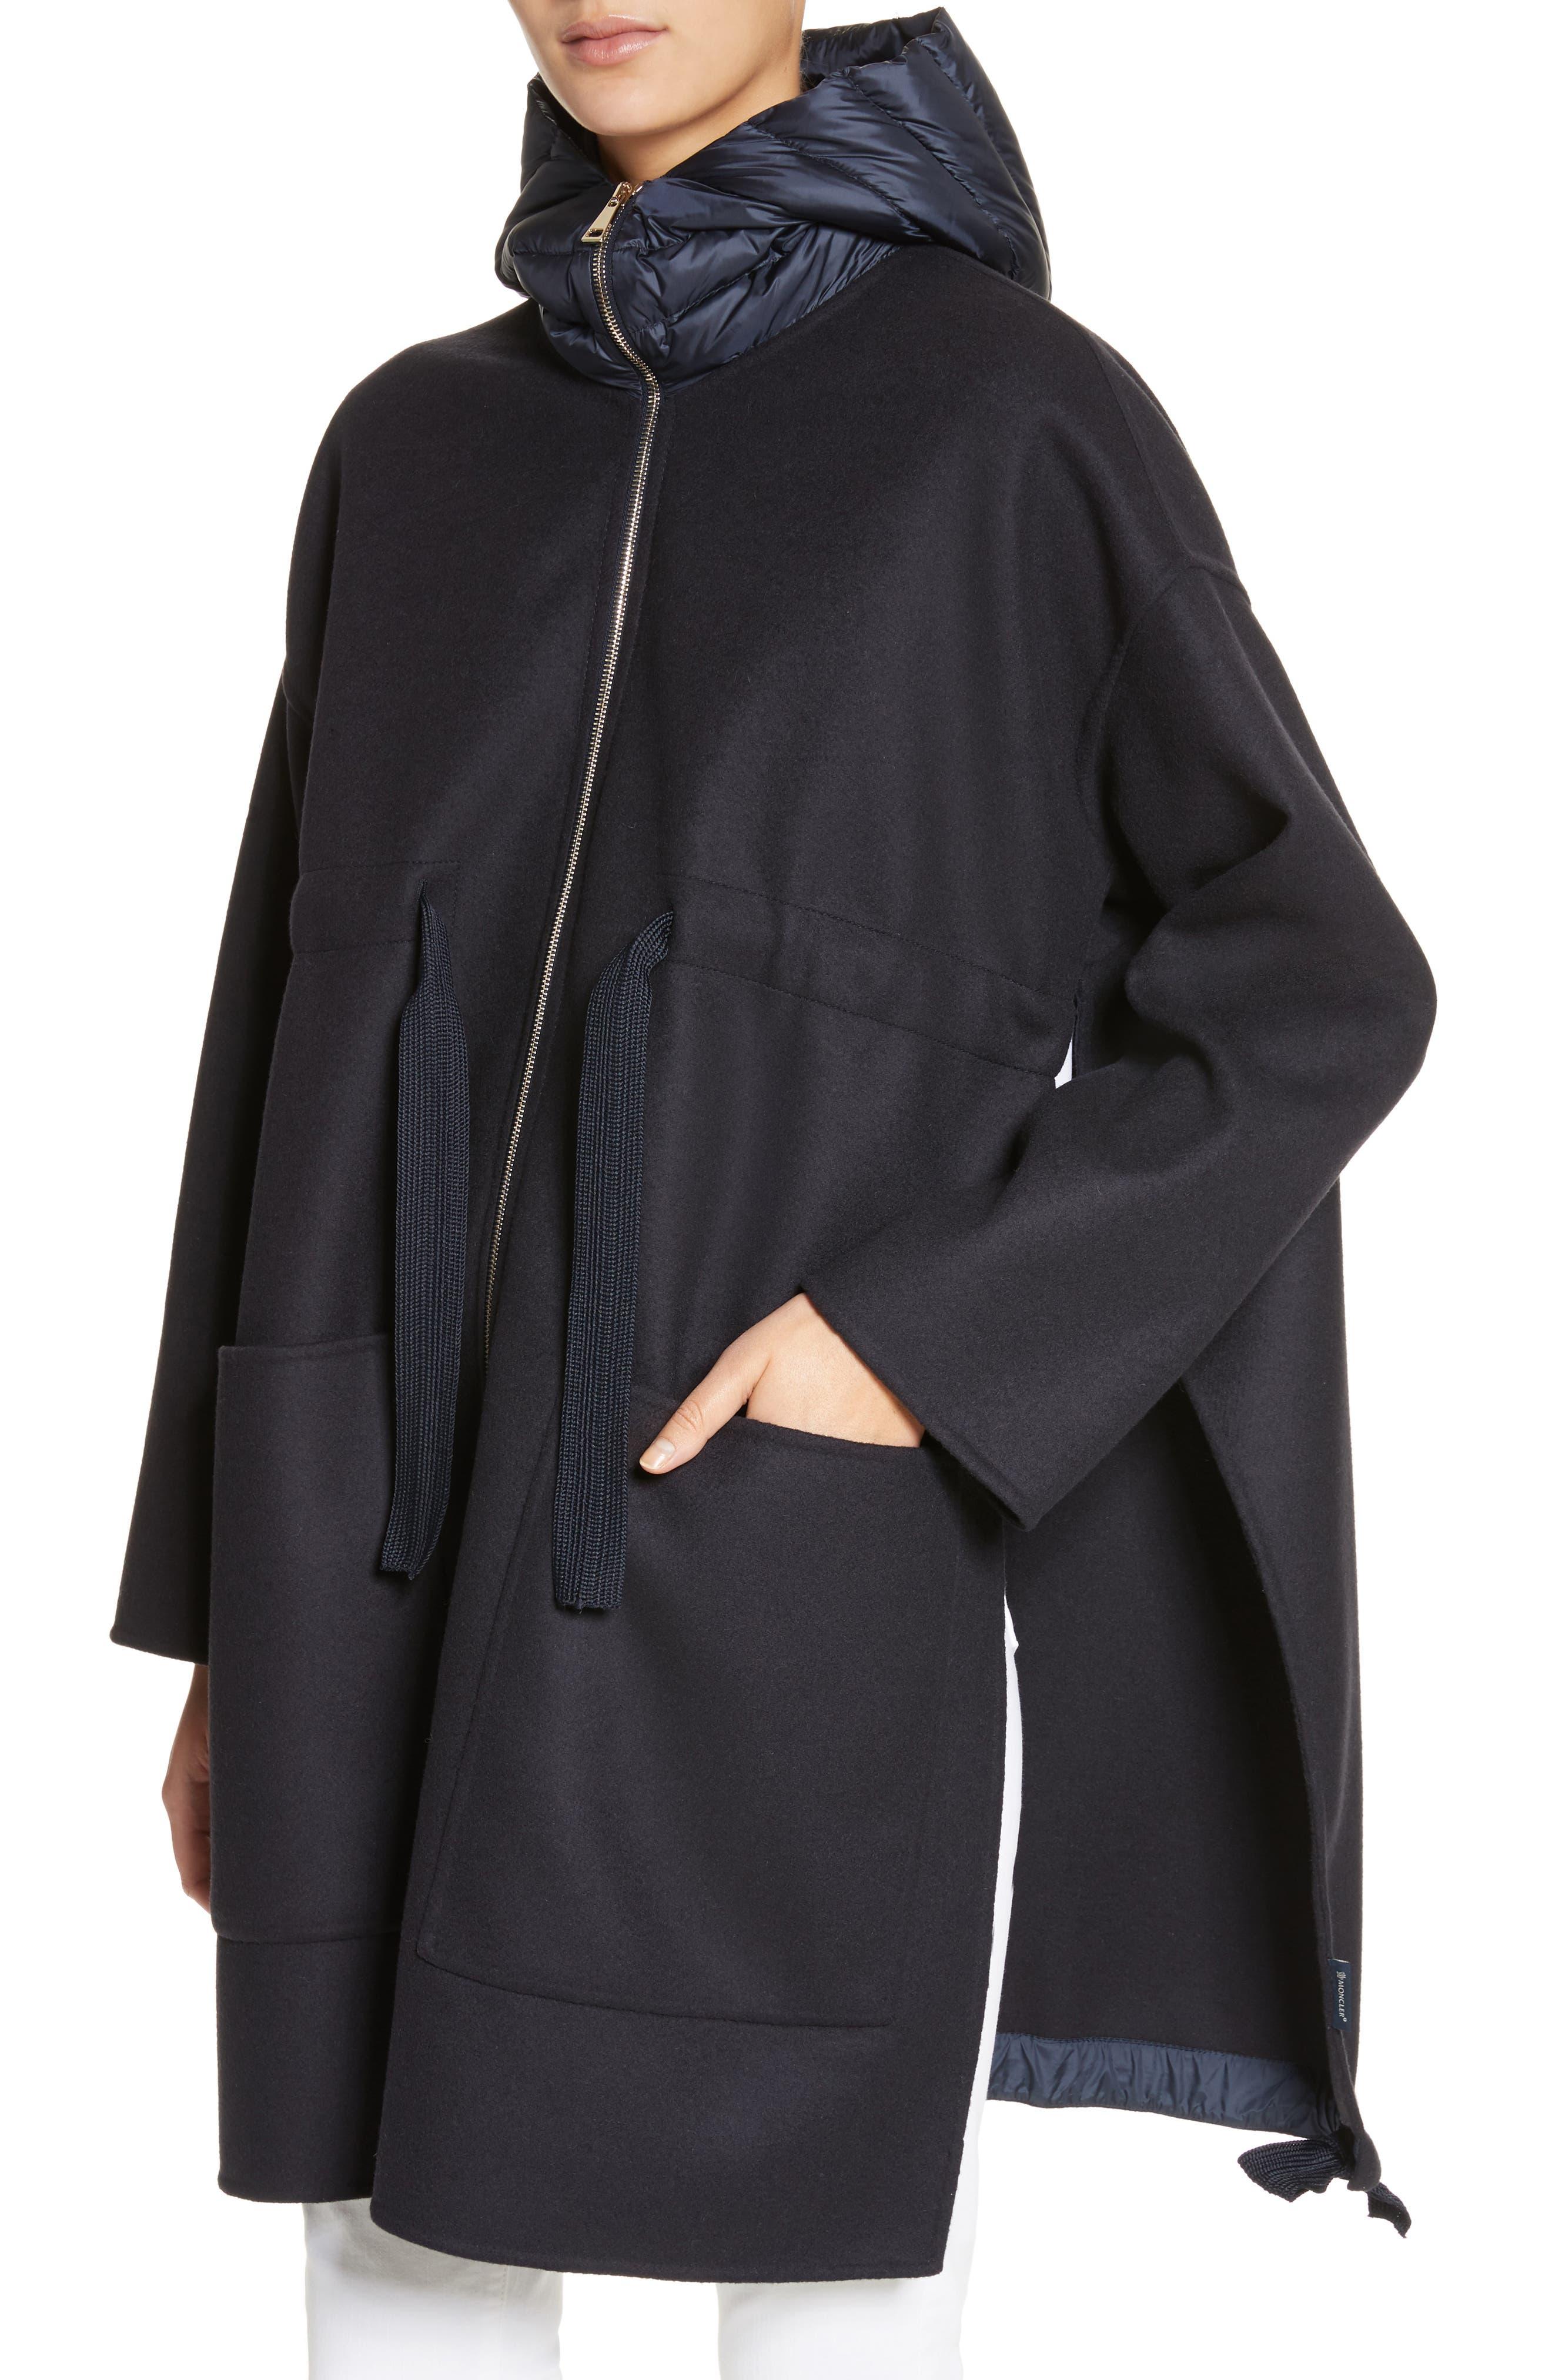 Grenat Wool & Cashmere Hooded Jacket,                             Alternate thumbnail 4, color,                             419